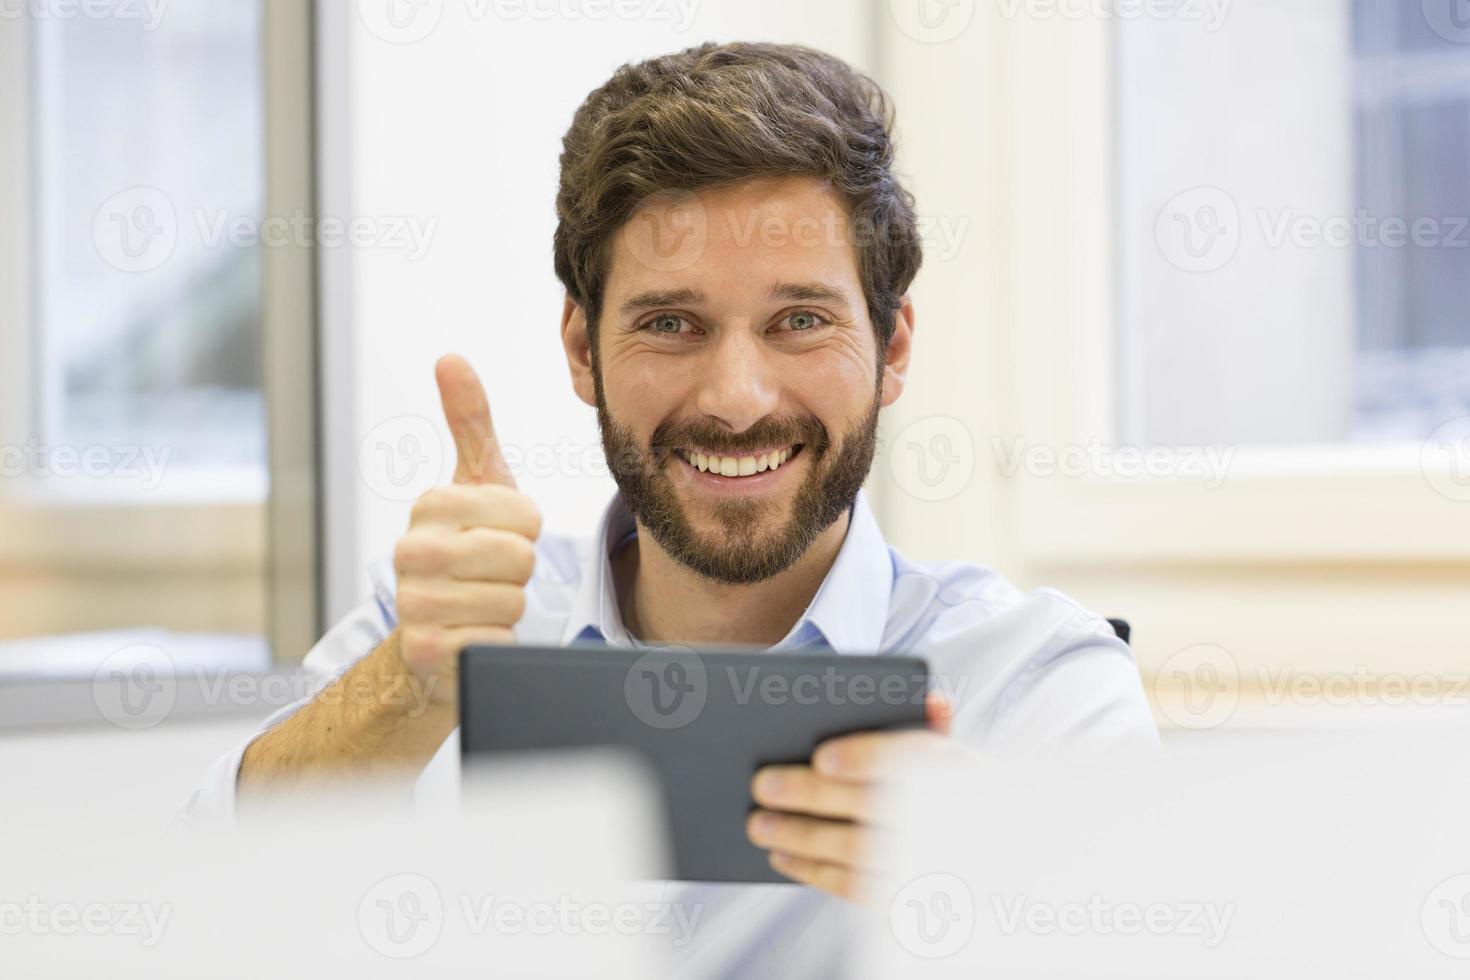 One joyful man holding digital tablet photo